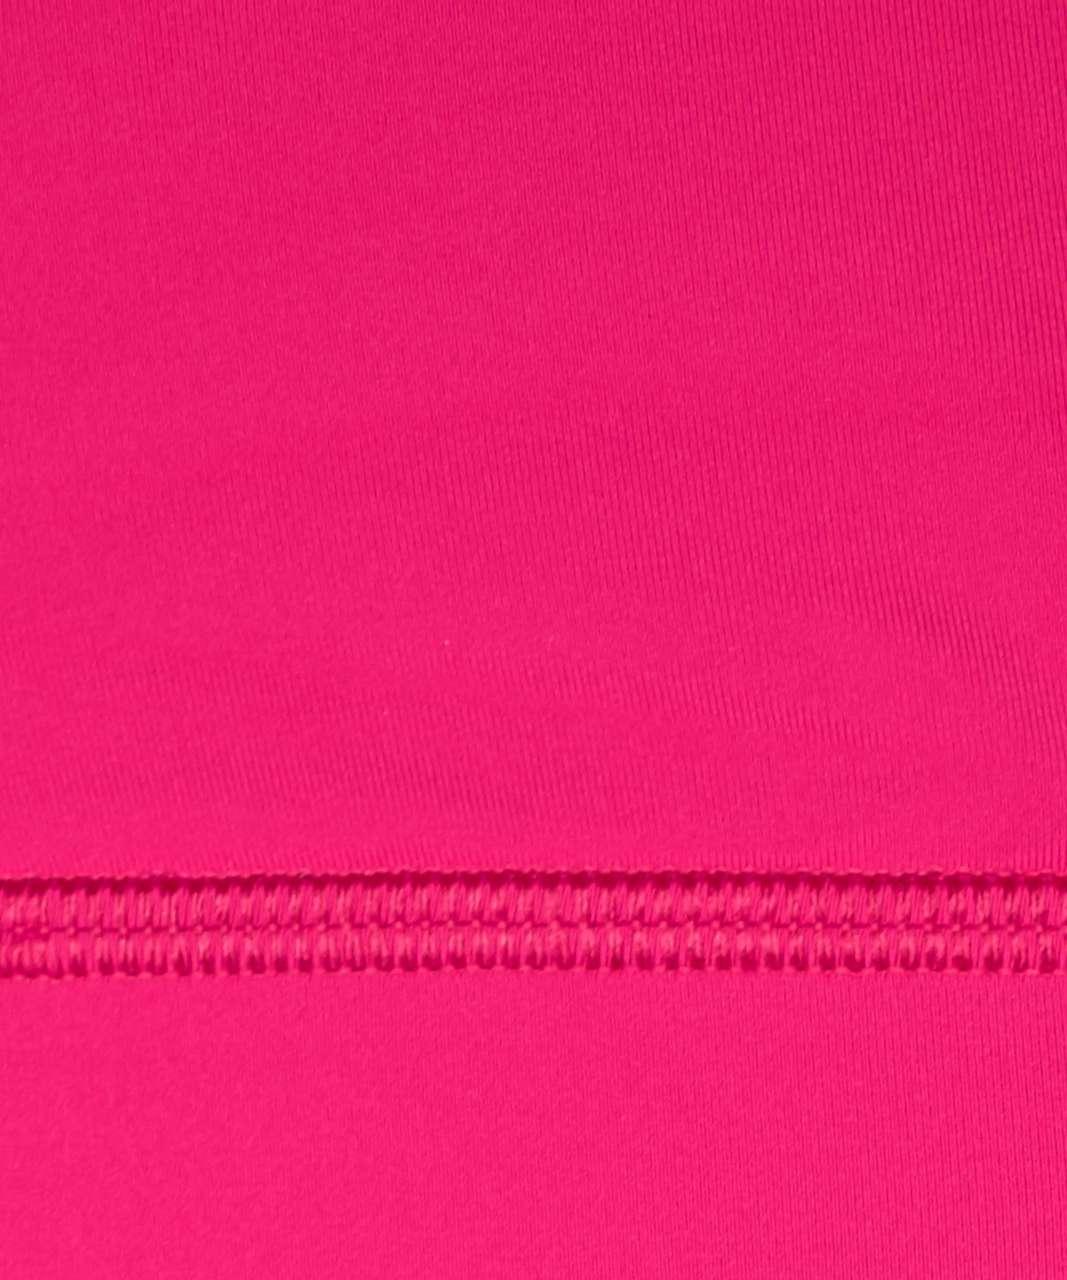 Lululemon Energy Bra - Calypso Pink